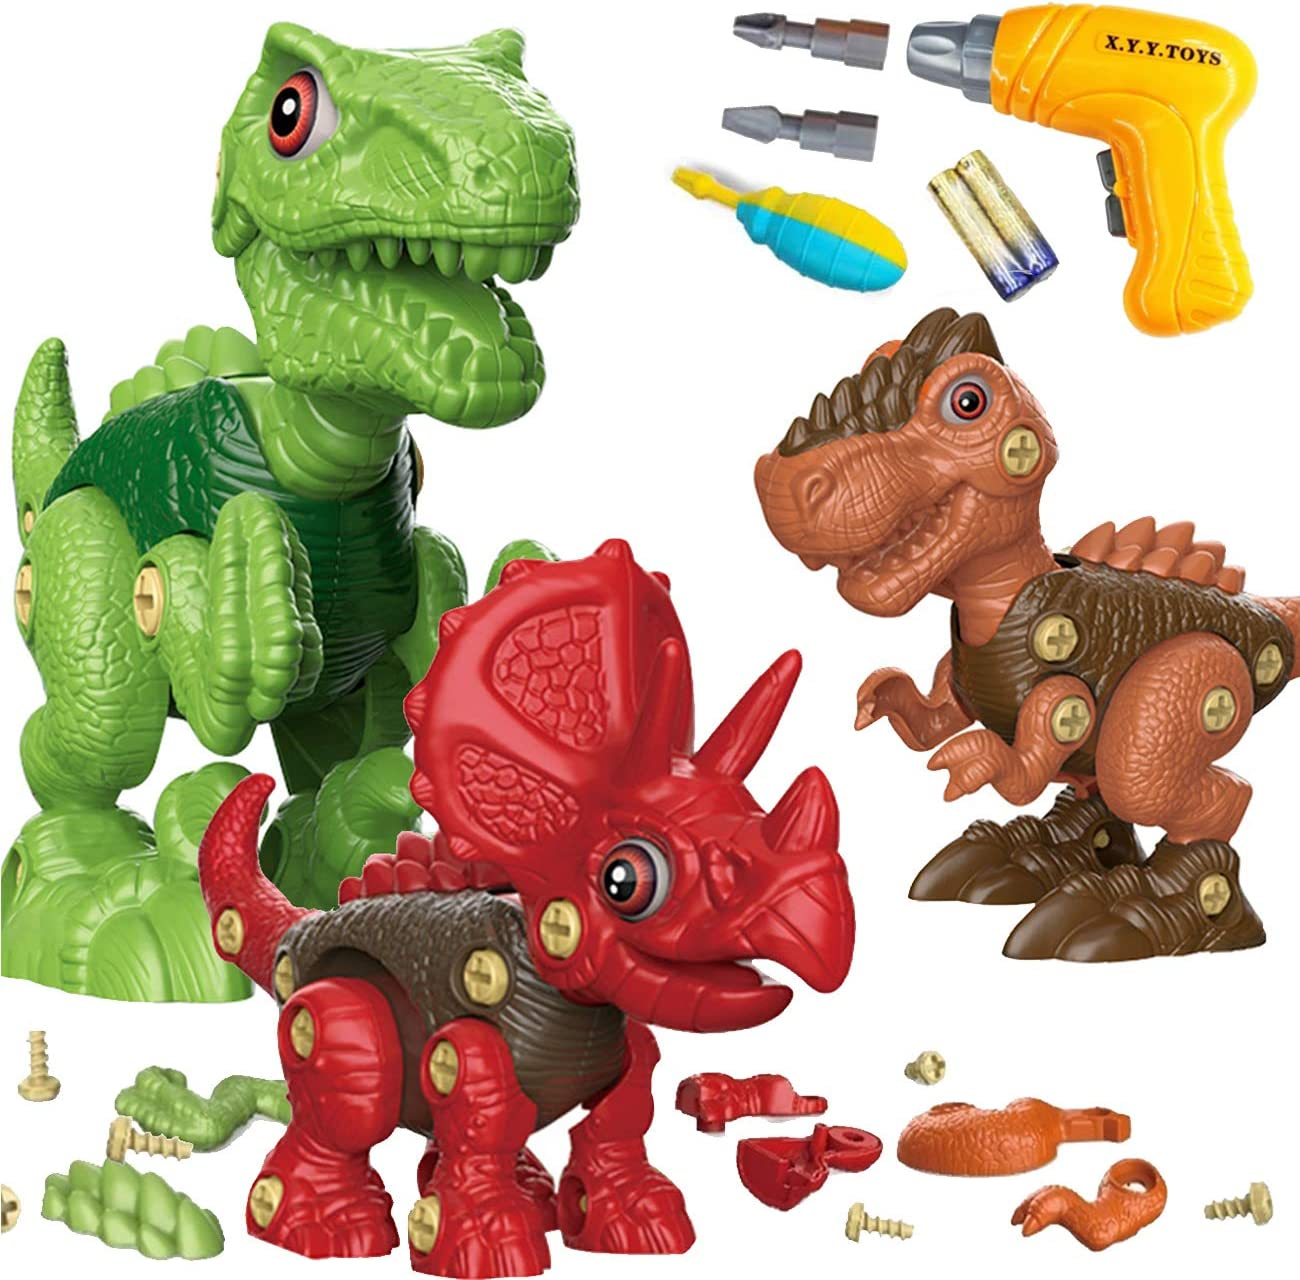 BDwing 3PCS Dinosaurios Juguetes Kit con Taladro , Juego Construccion Puzzle Dinosaurios Playmobil Incluyen Tiranosaurio Rex, Velociraptor y Triceratops Jurasic Wold Dinosaurios para Niños y Niñas